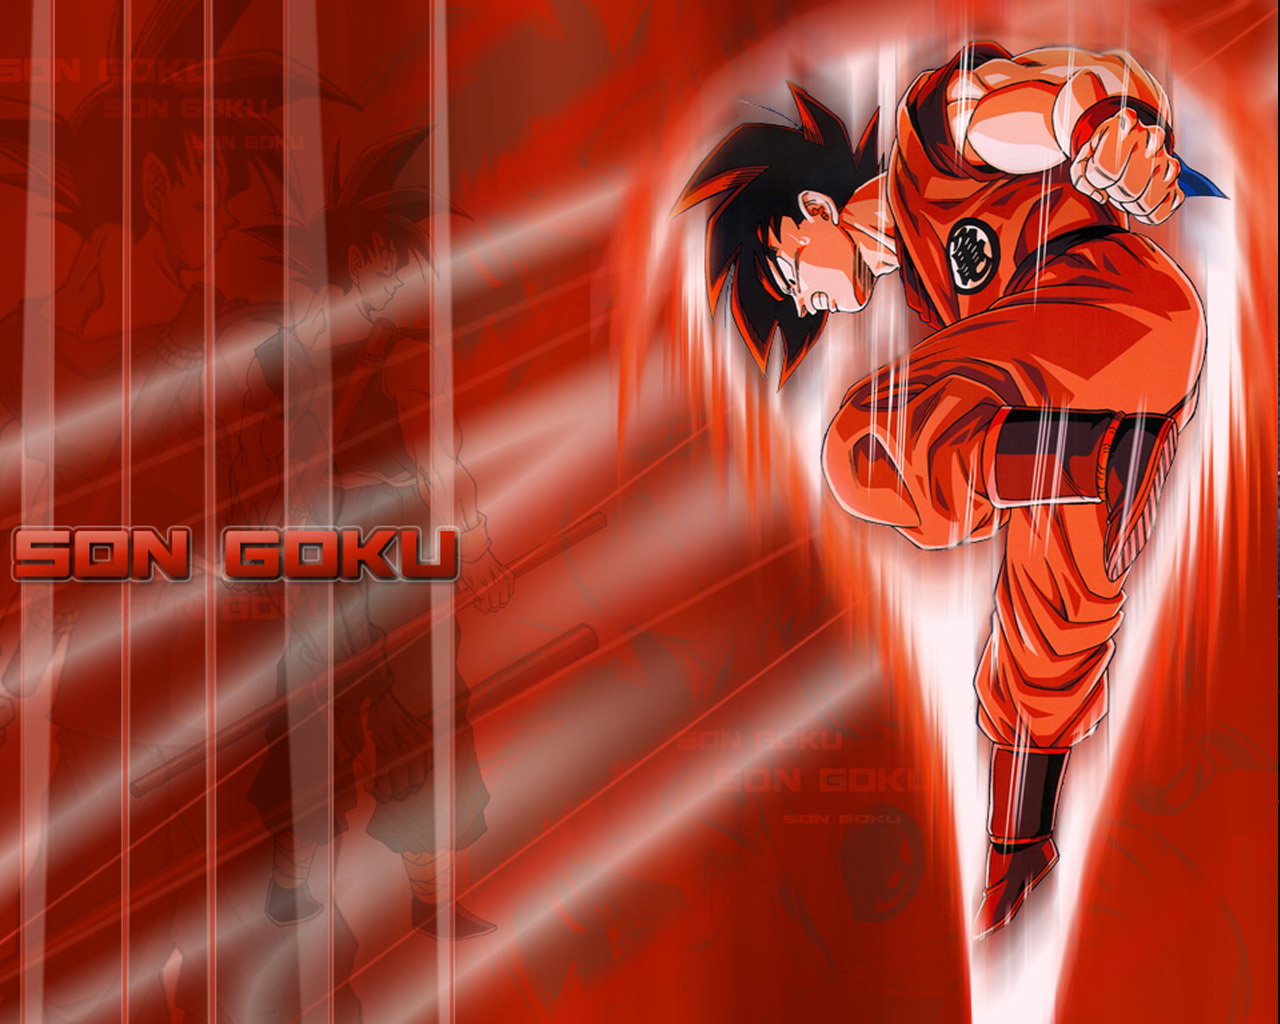 http://3.bp.blogspot.com/_eVGm8L70C2I/TO3Tns4xLPI/AAAAAAAAAKs/9w2LZpsk0hk/s1600/goku-kaioken.jpg